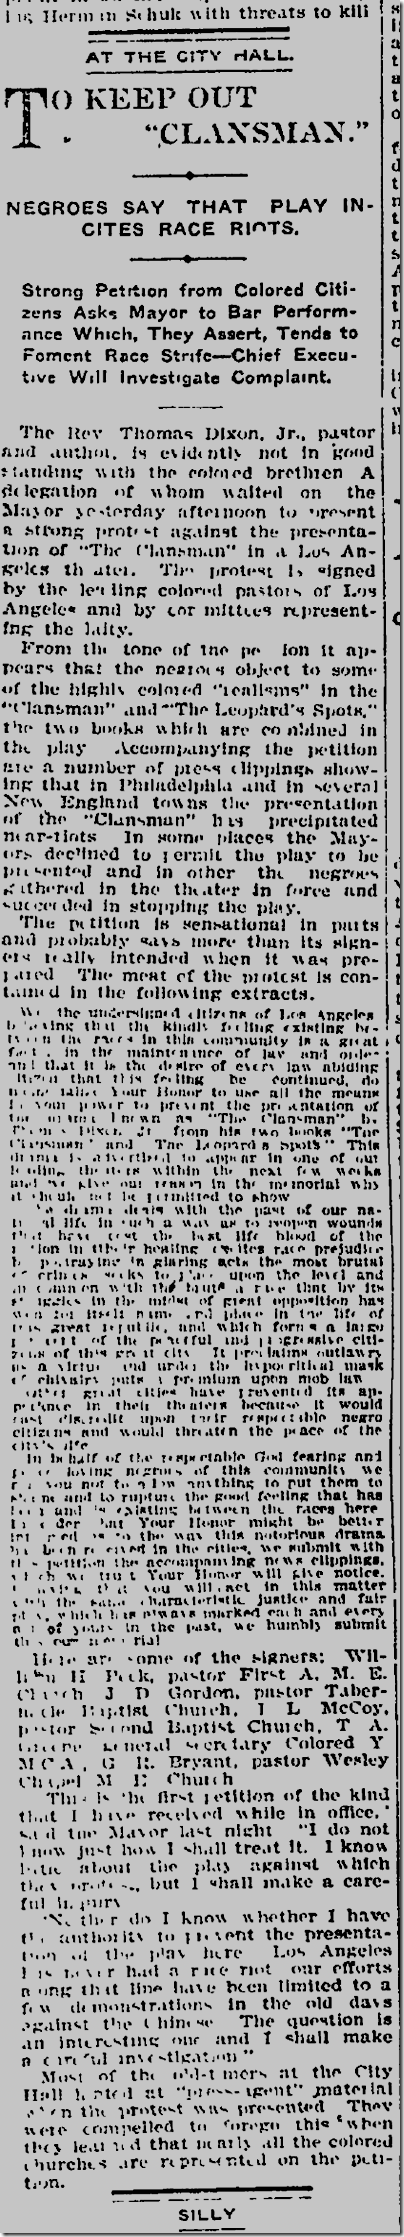 Oct. 1, 1908, Clansman